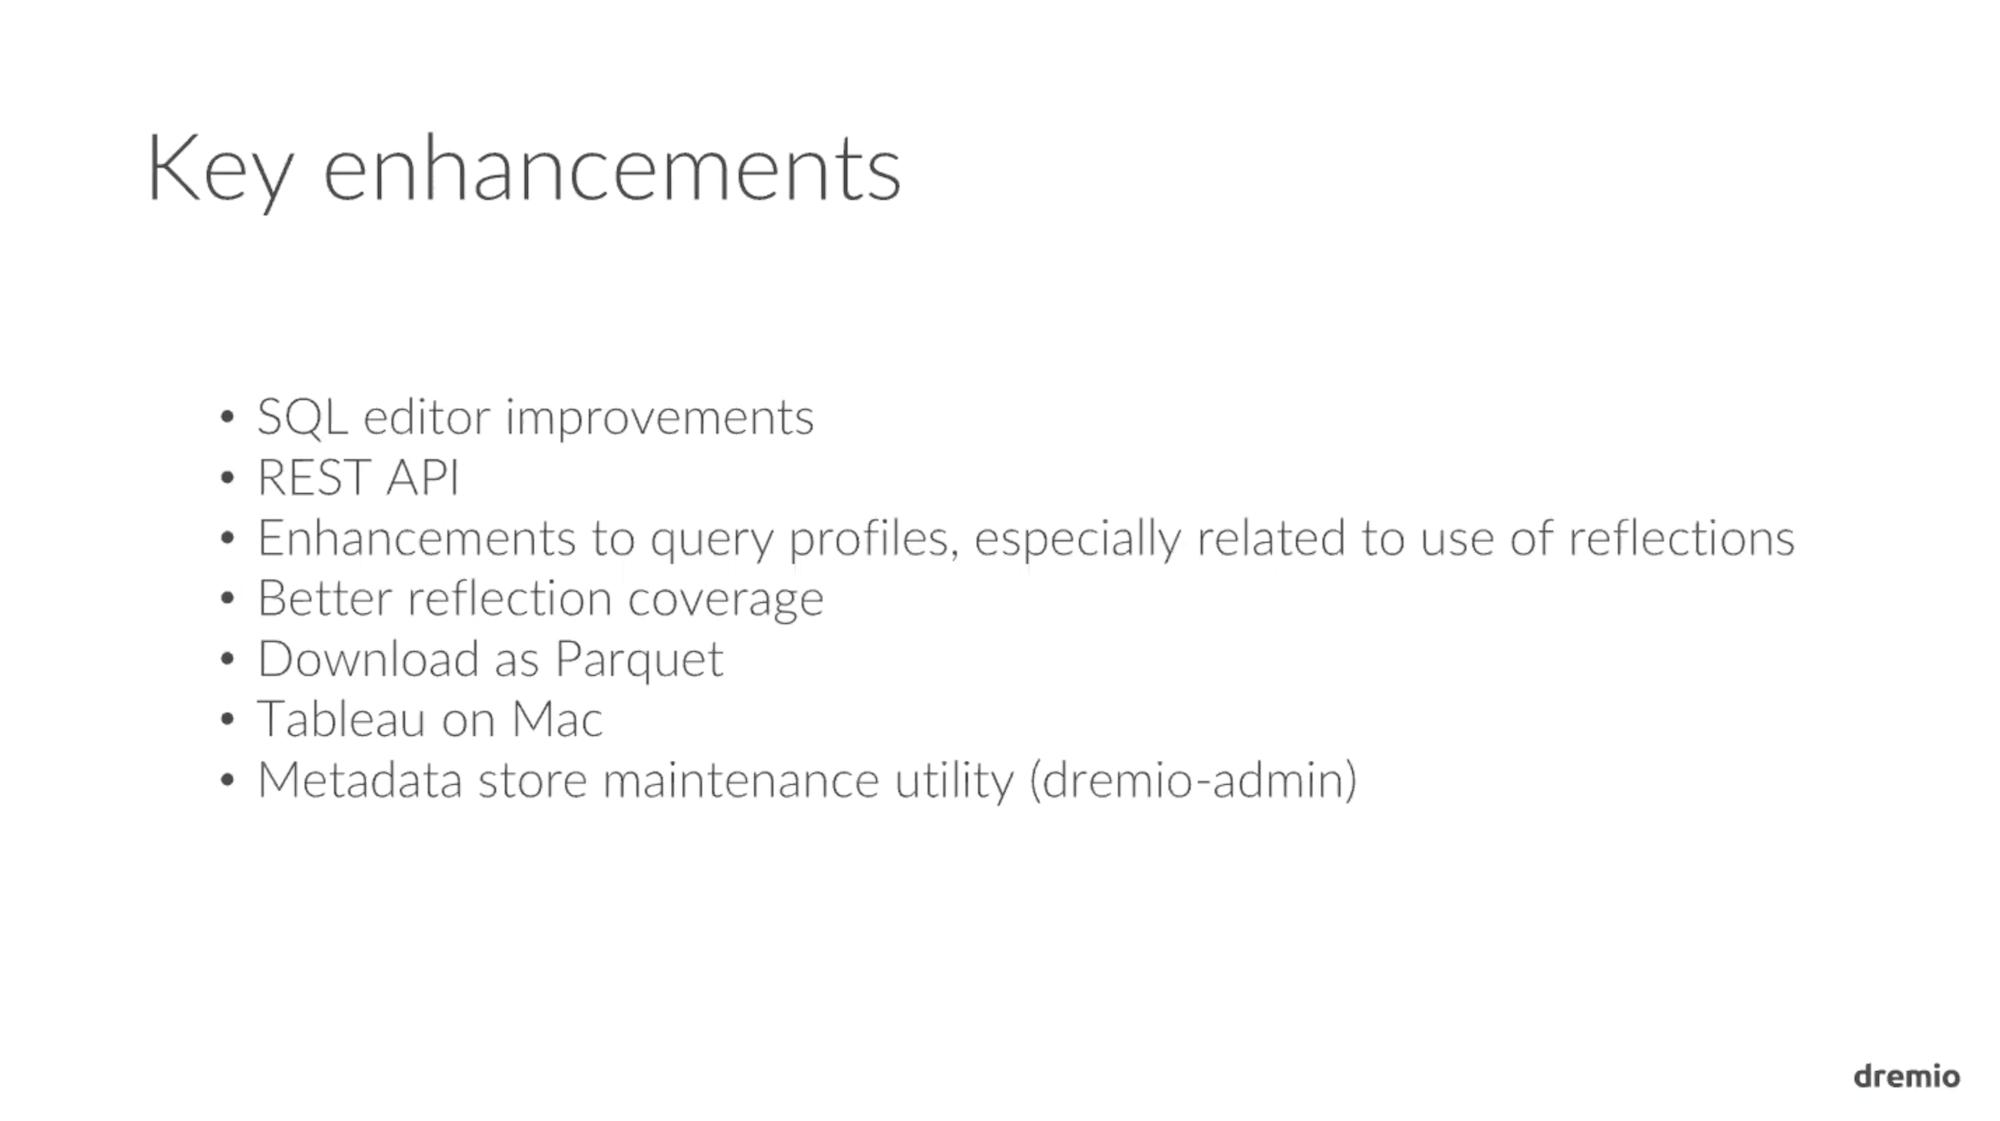 Dremio 1.3 Key Enhancements